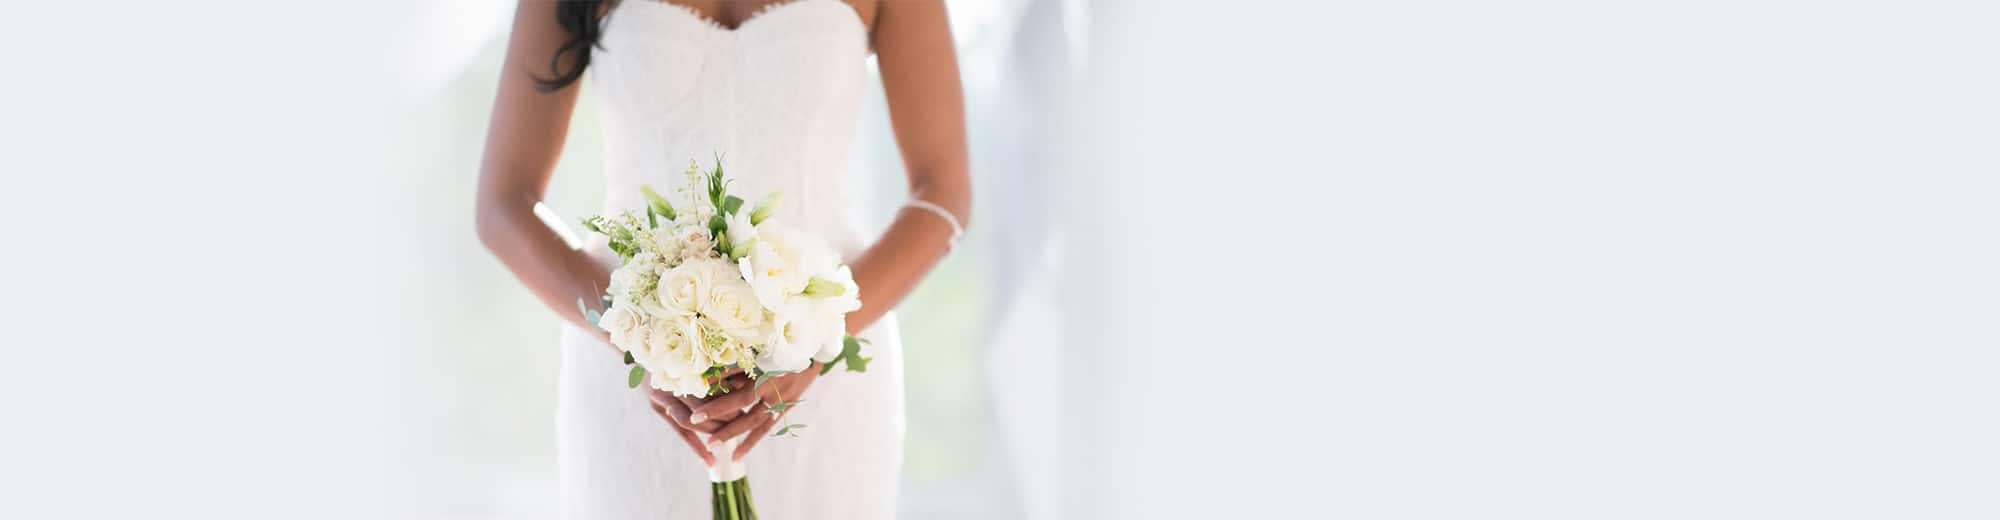 trusted wedding partners for luxury costa rica wedding